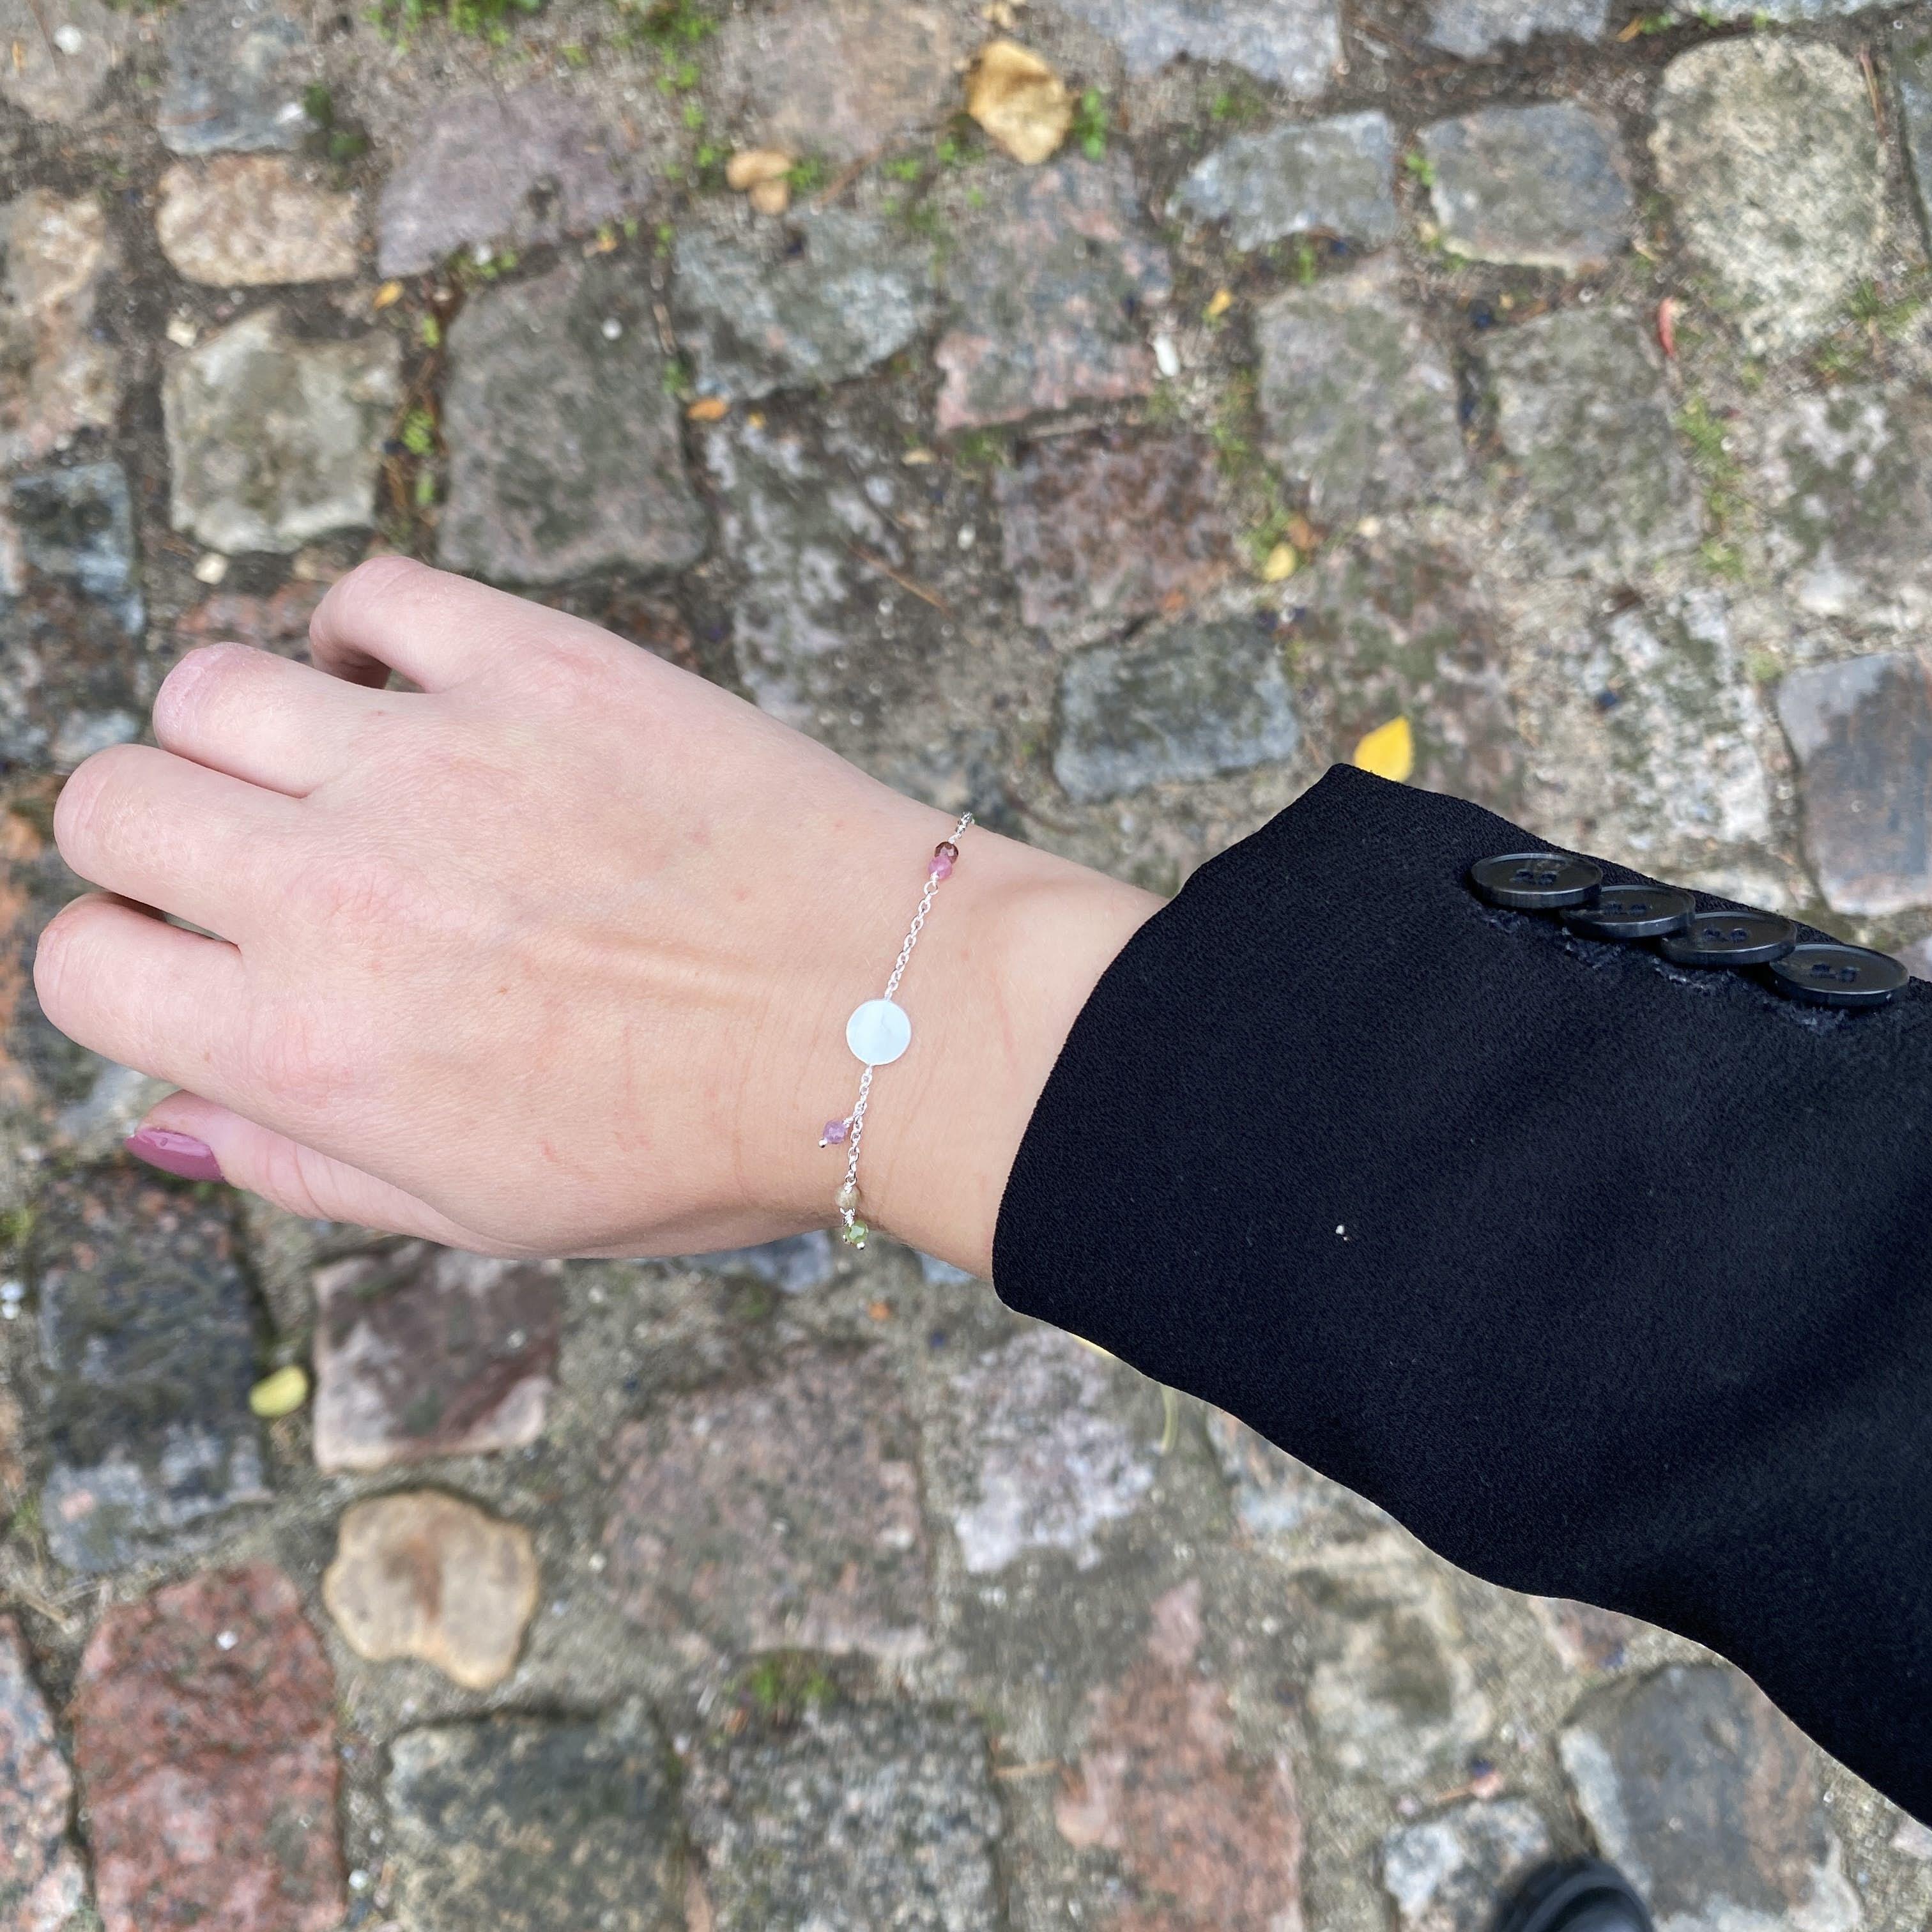 Afterglow Delicate bracelet